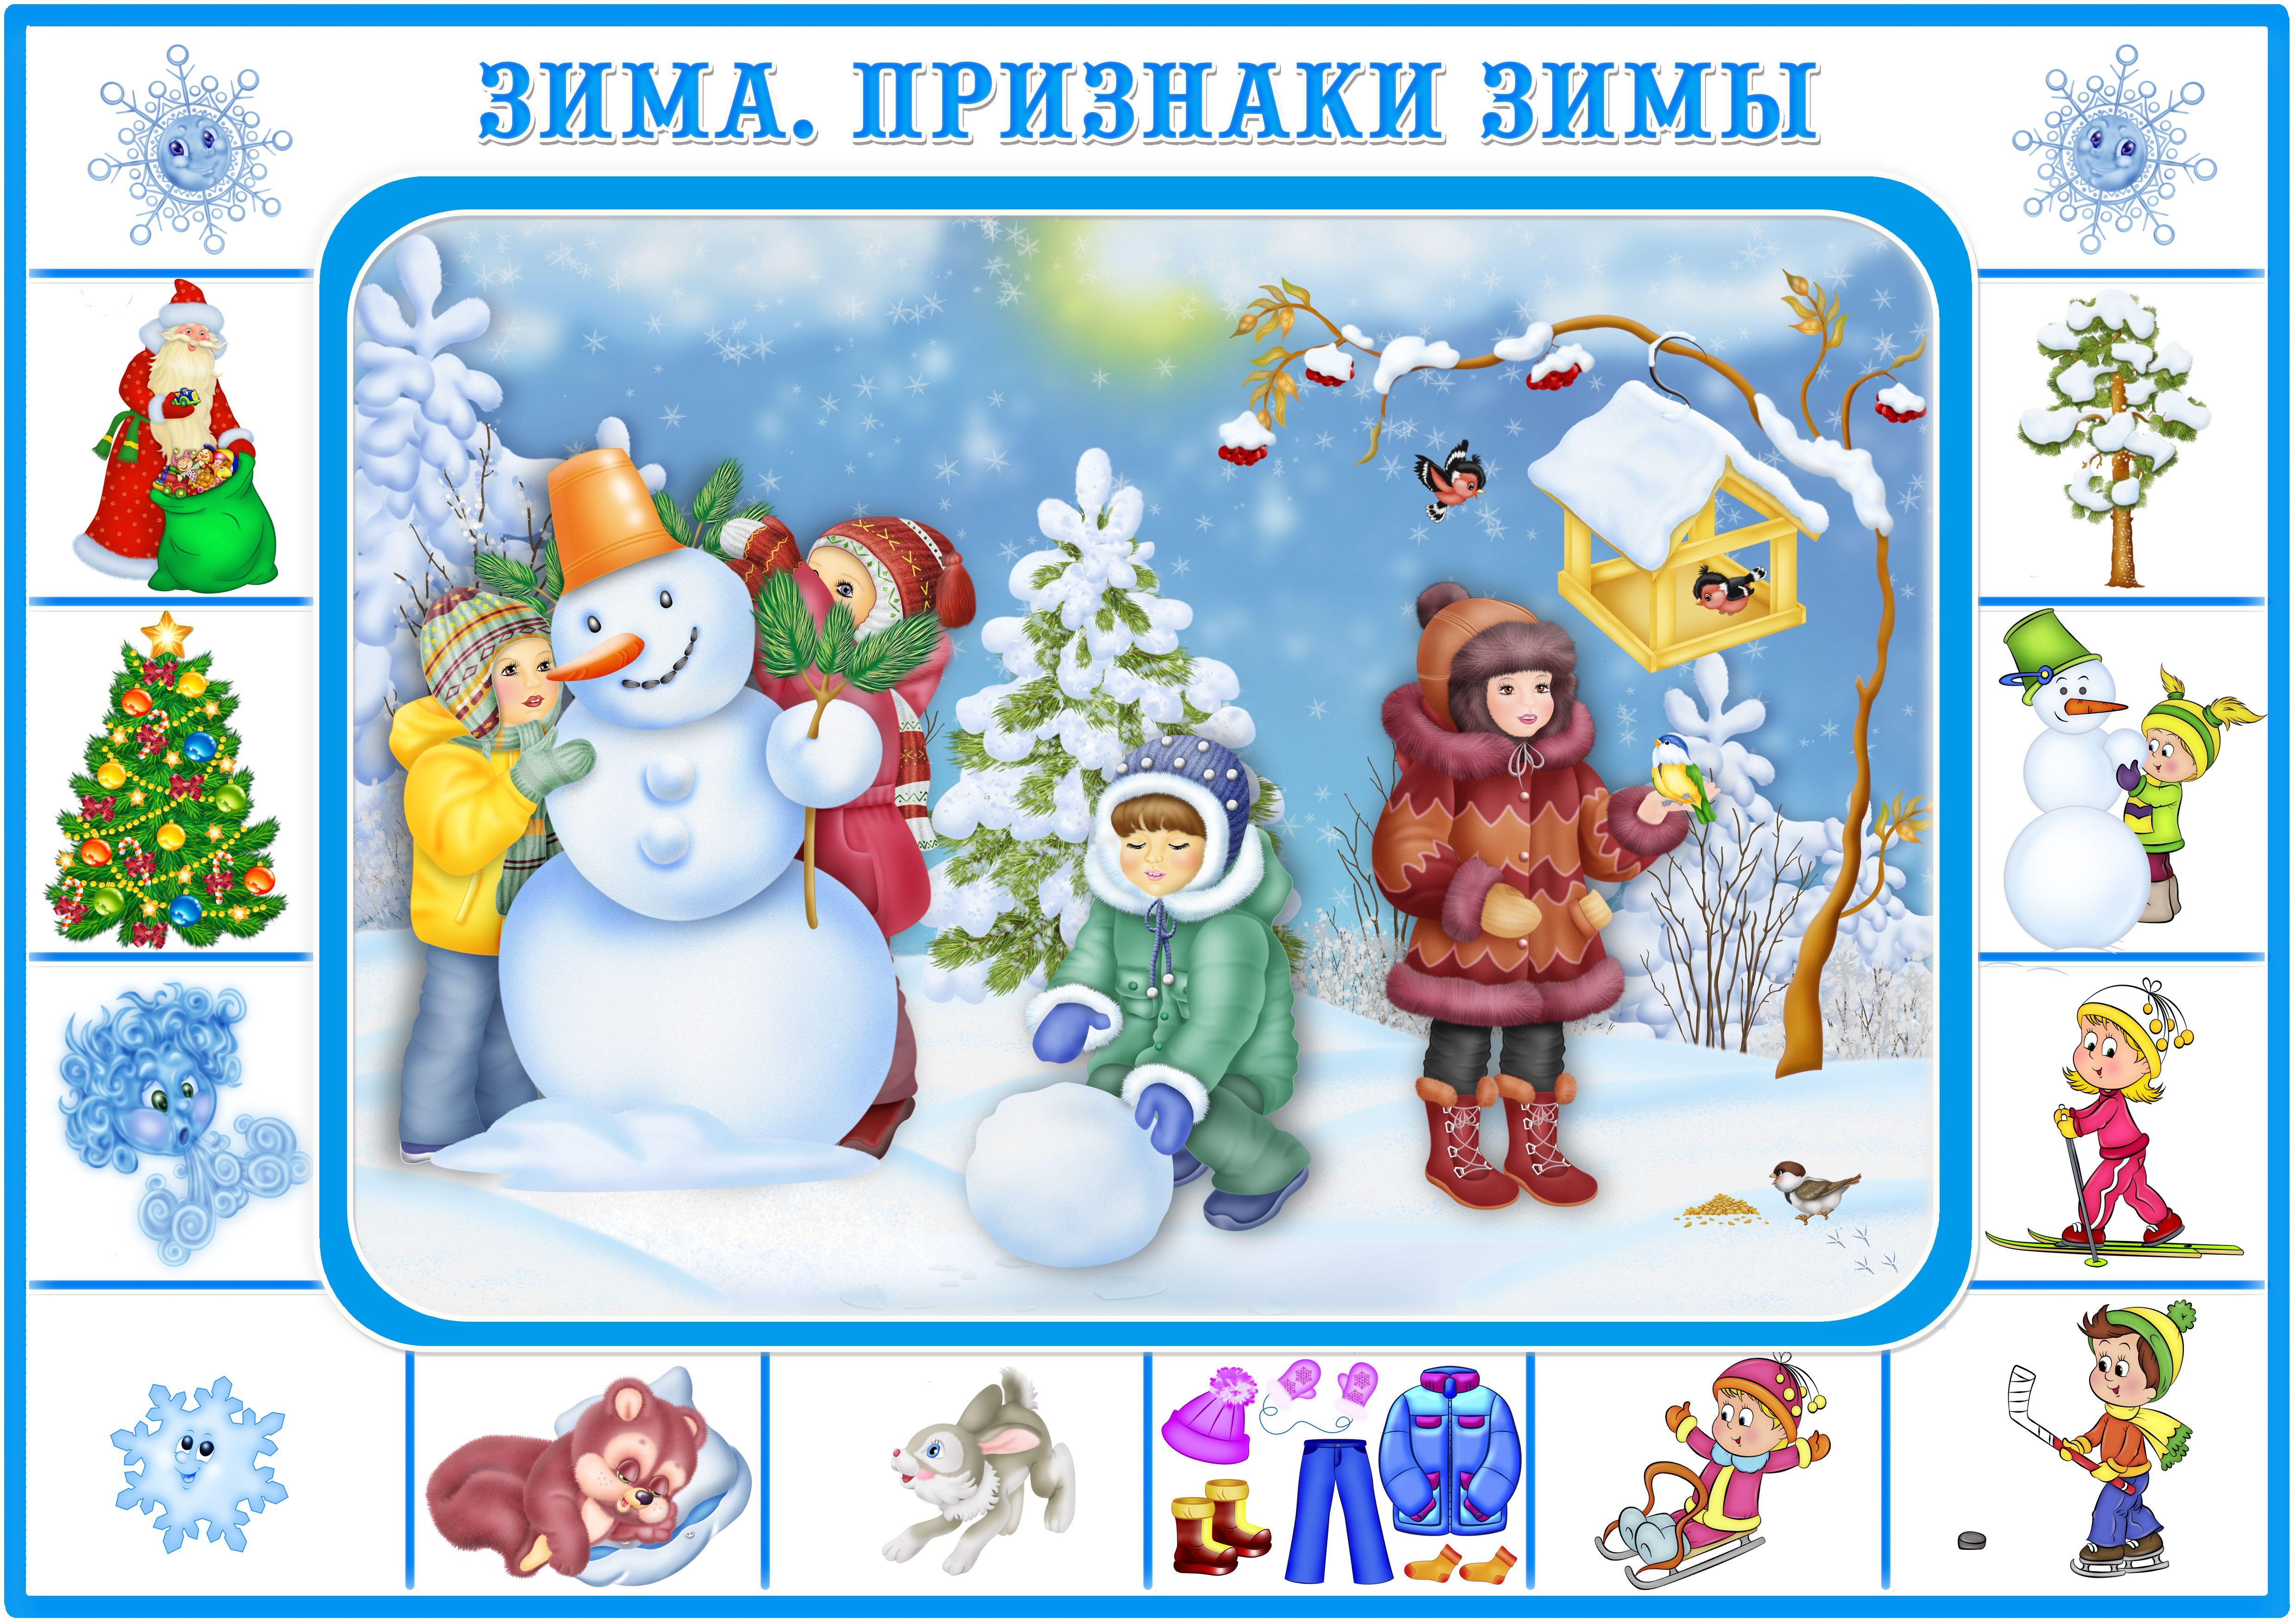 Приколы, картинки на тему признаки зимы